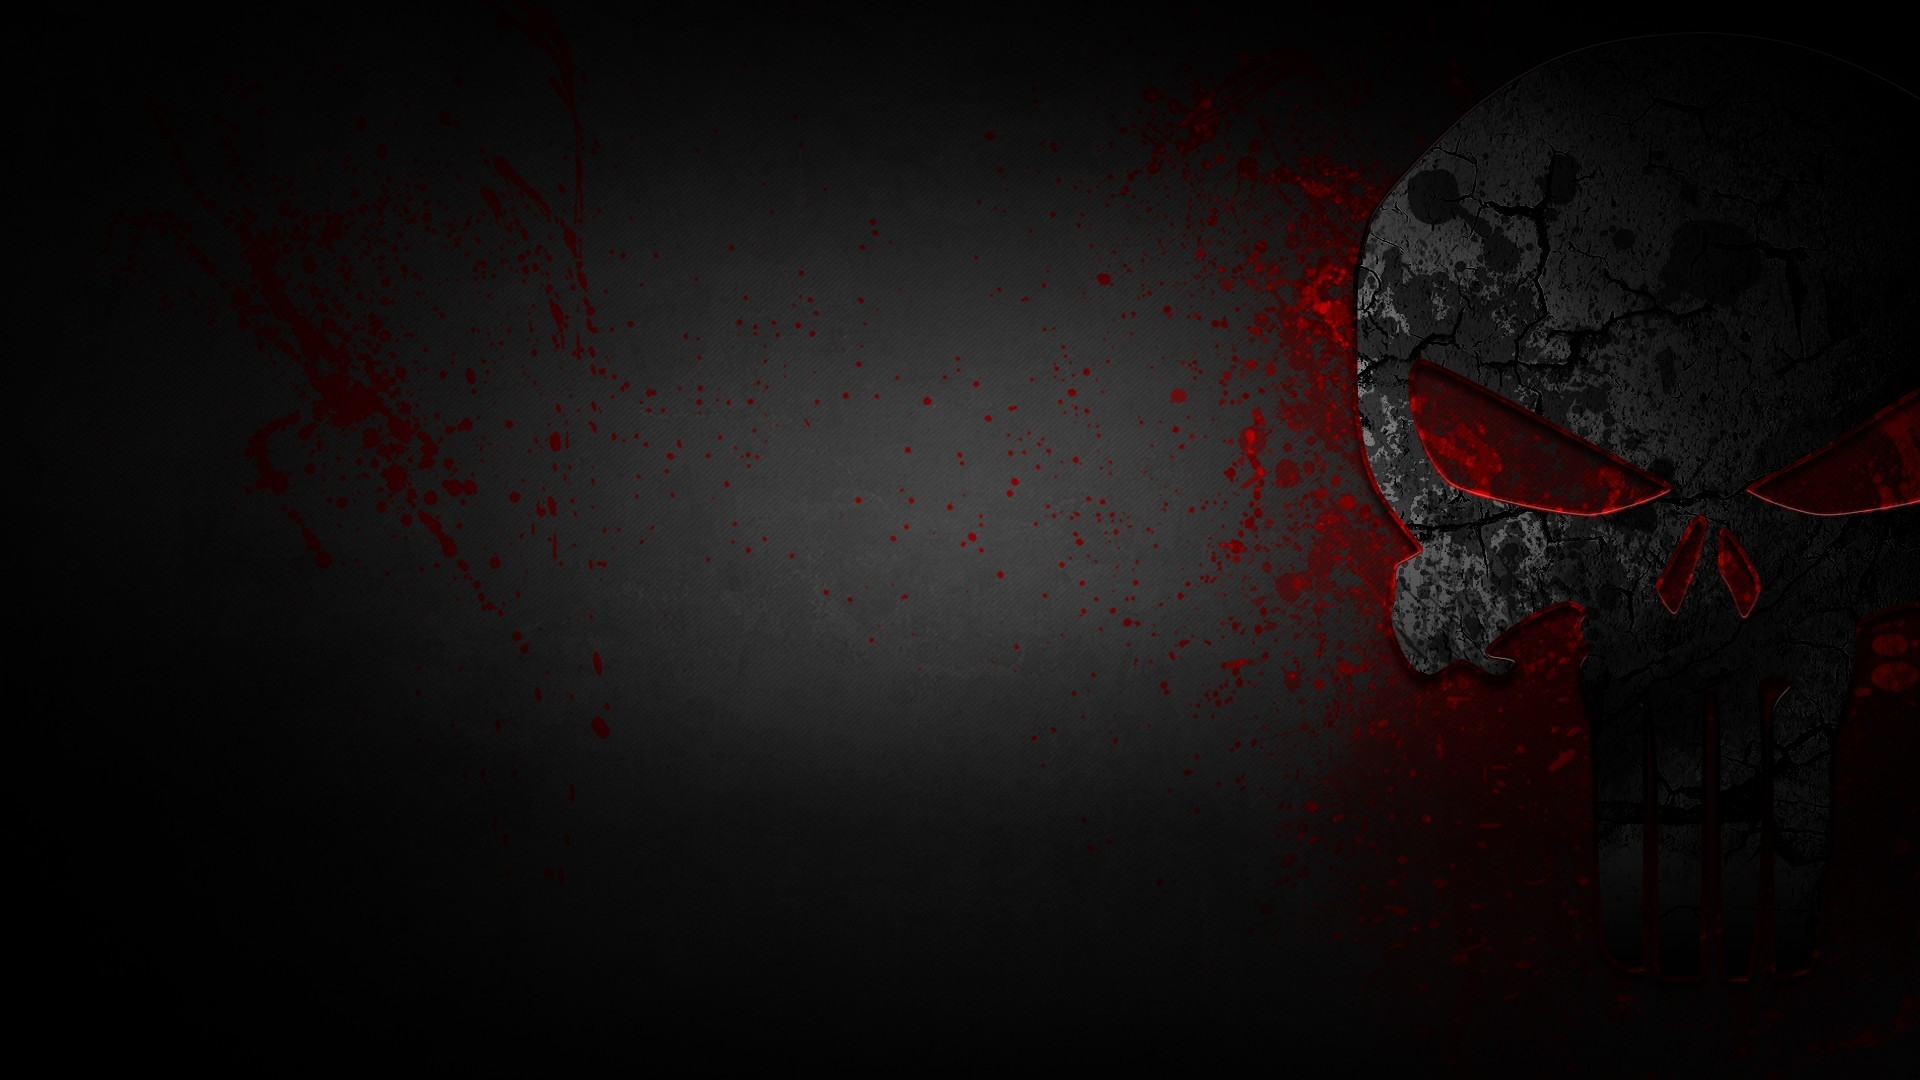 25 best ideas about Punisher logo on Pinterest | Punisher, The .